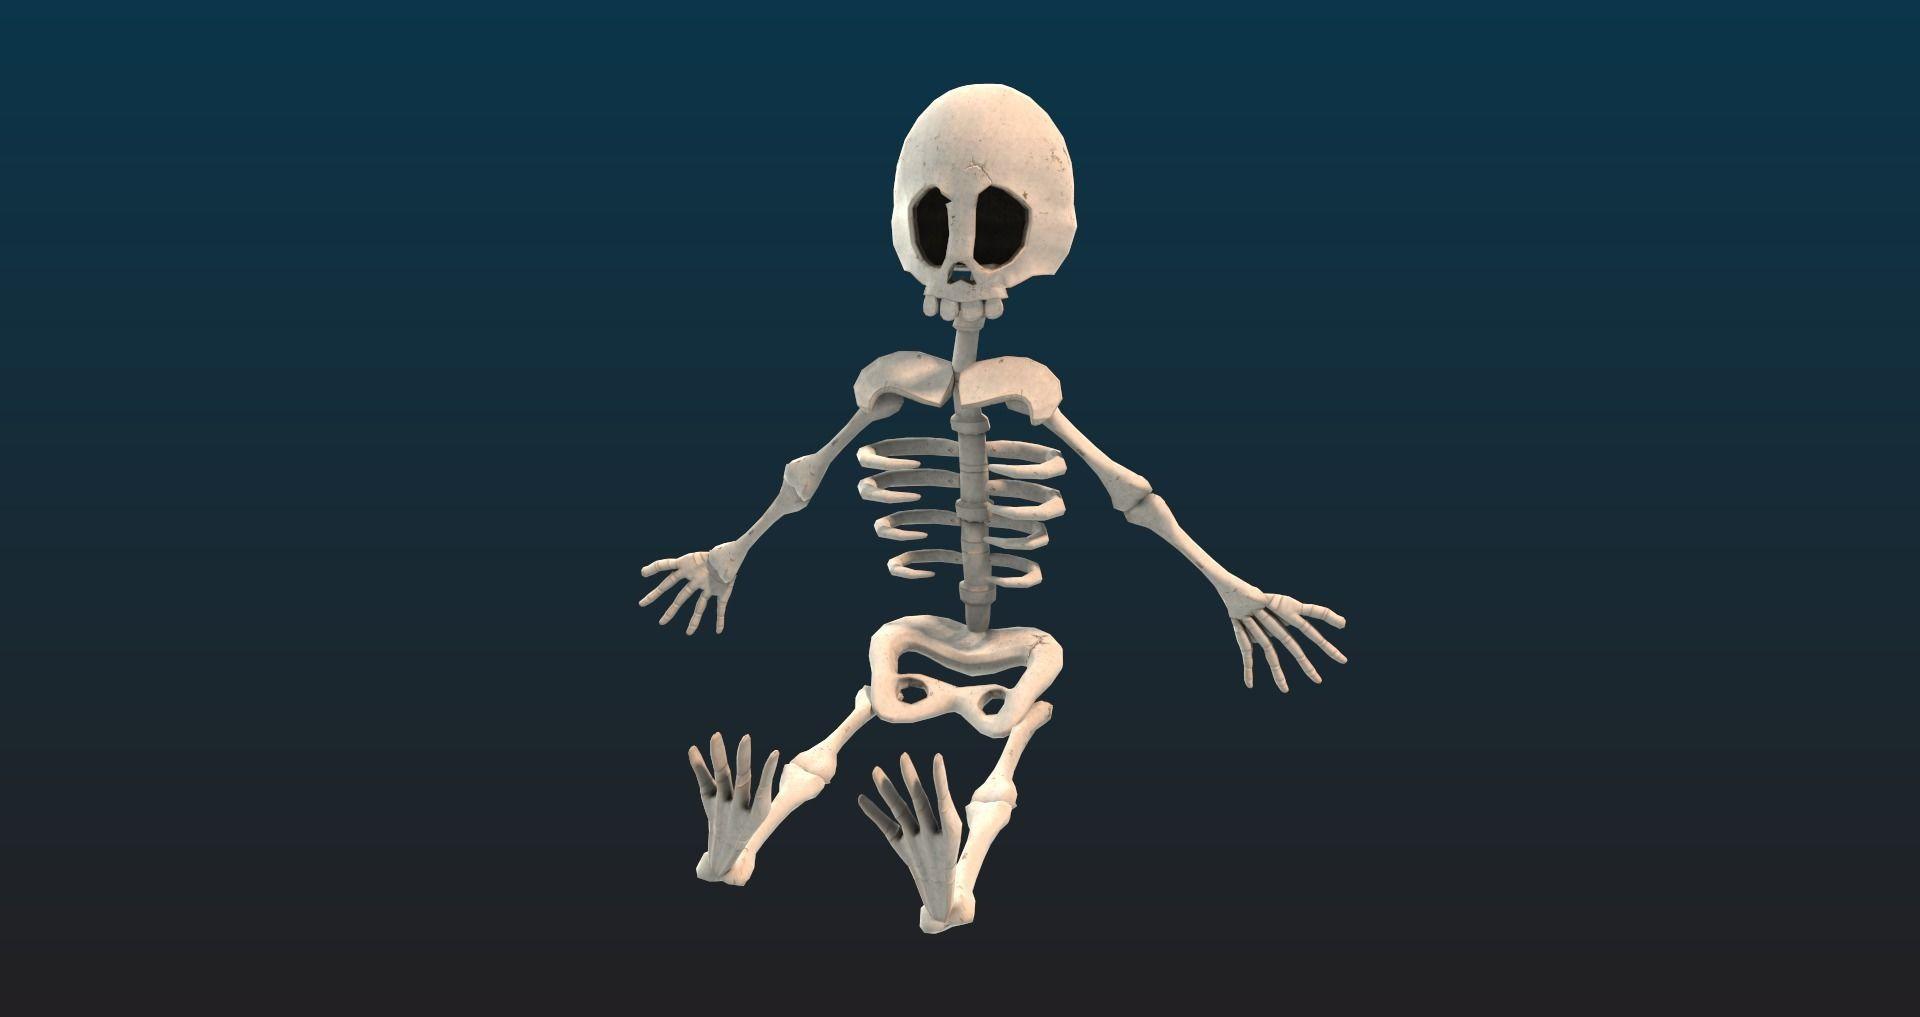 Cartoon style Skeleton for games